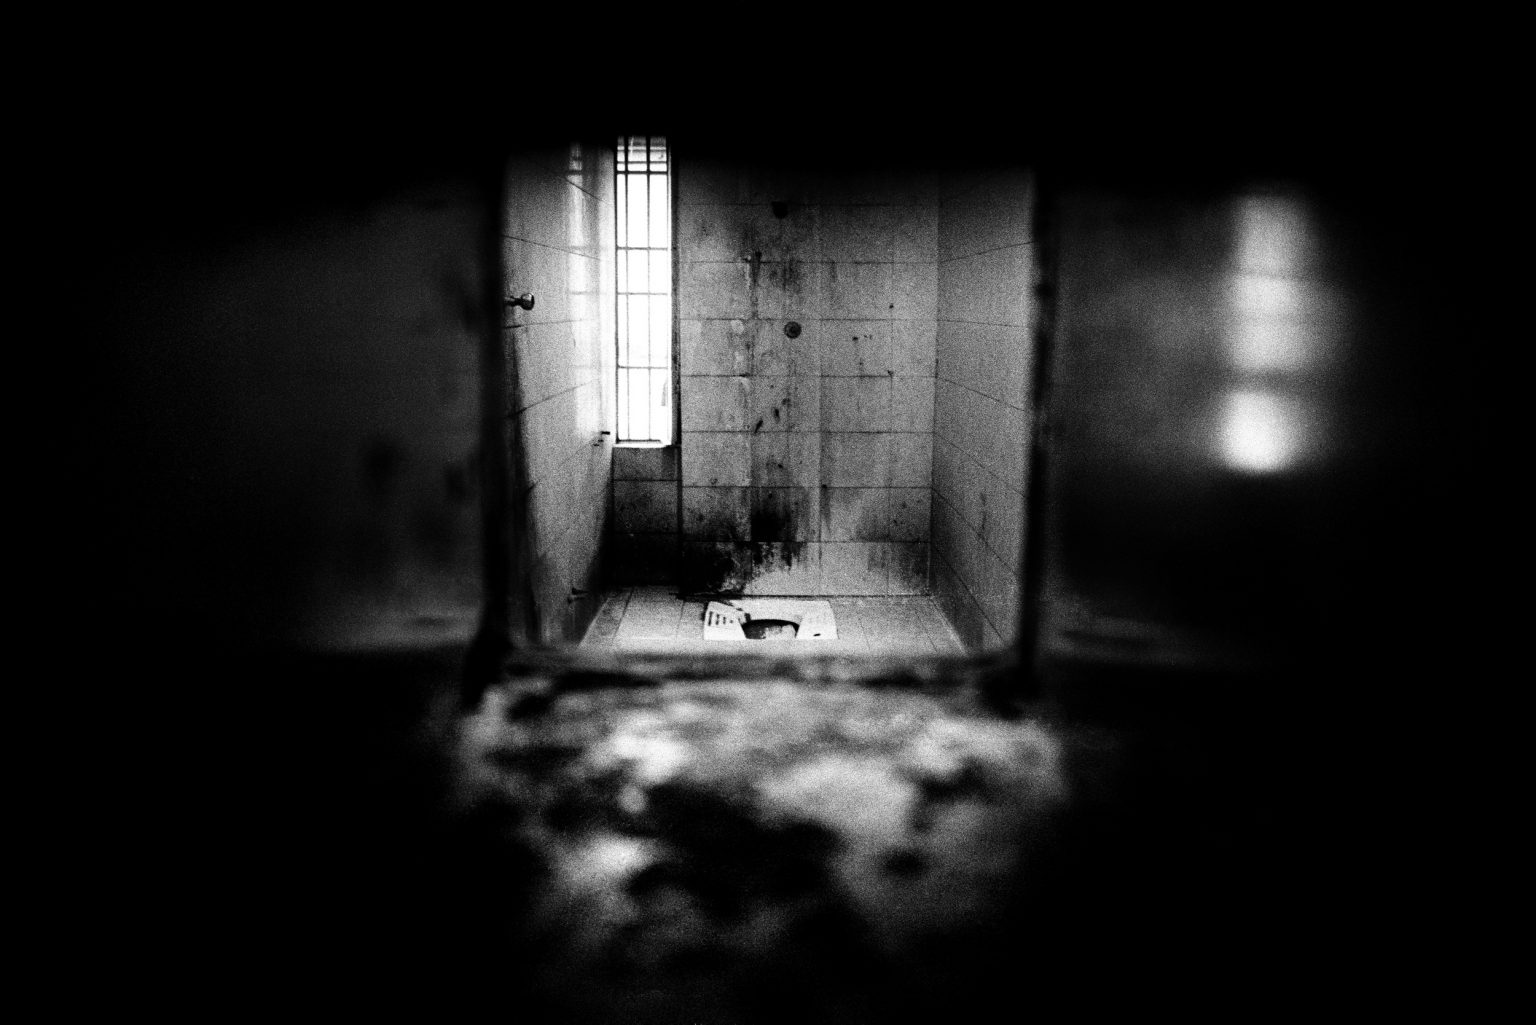 Bathroom inside a six-bed dormitory. Judicial Psychiatric Hospital. Aversa, Caserta, Italy, 2006